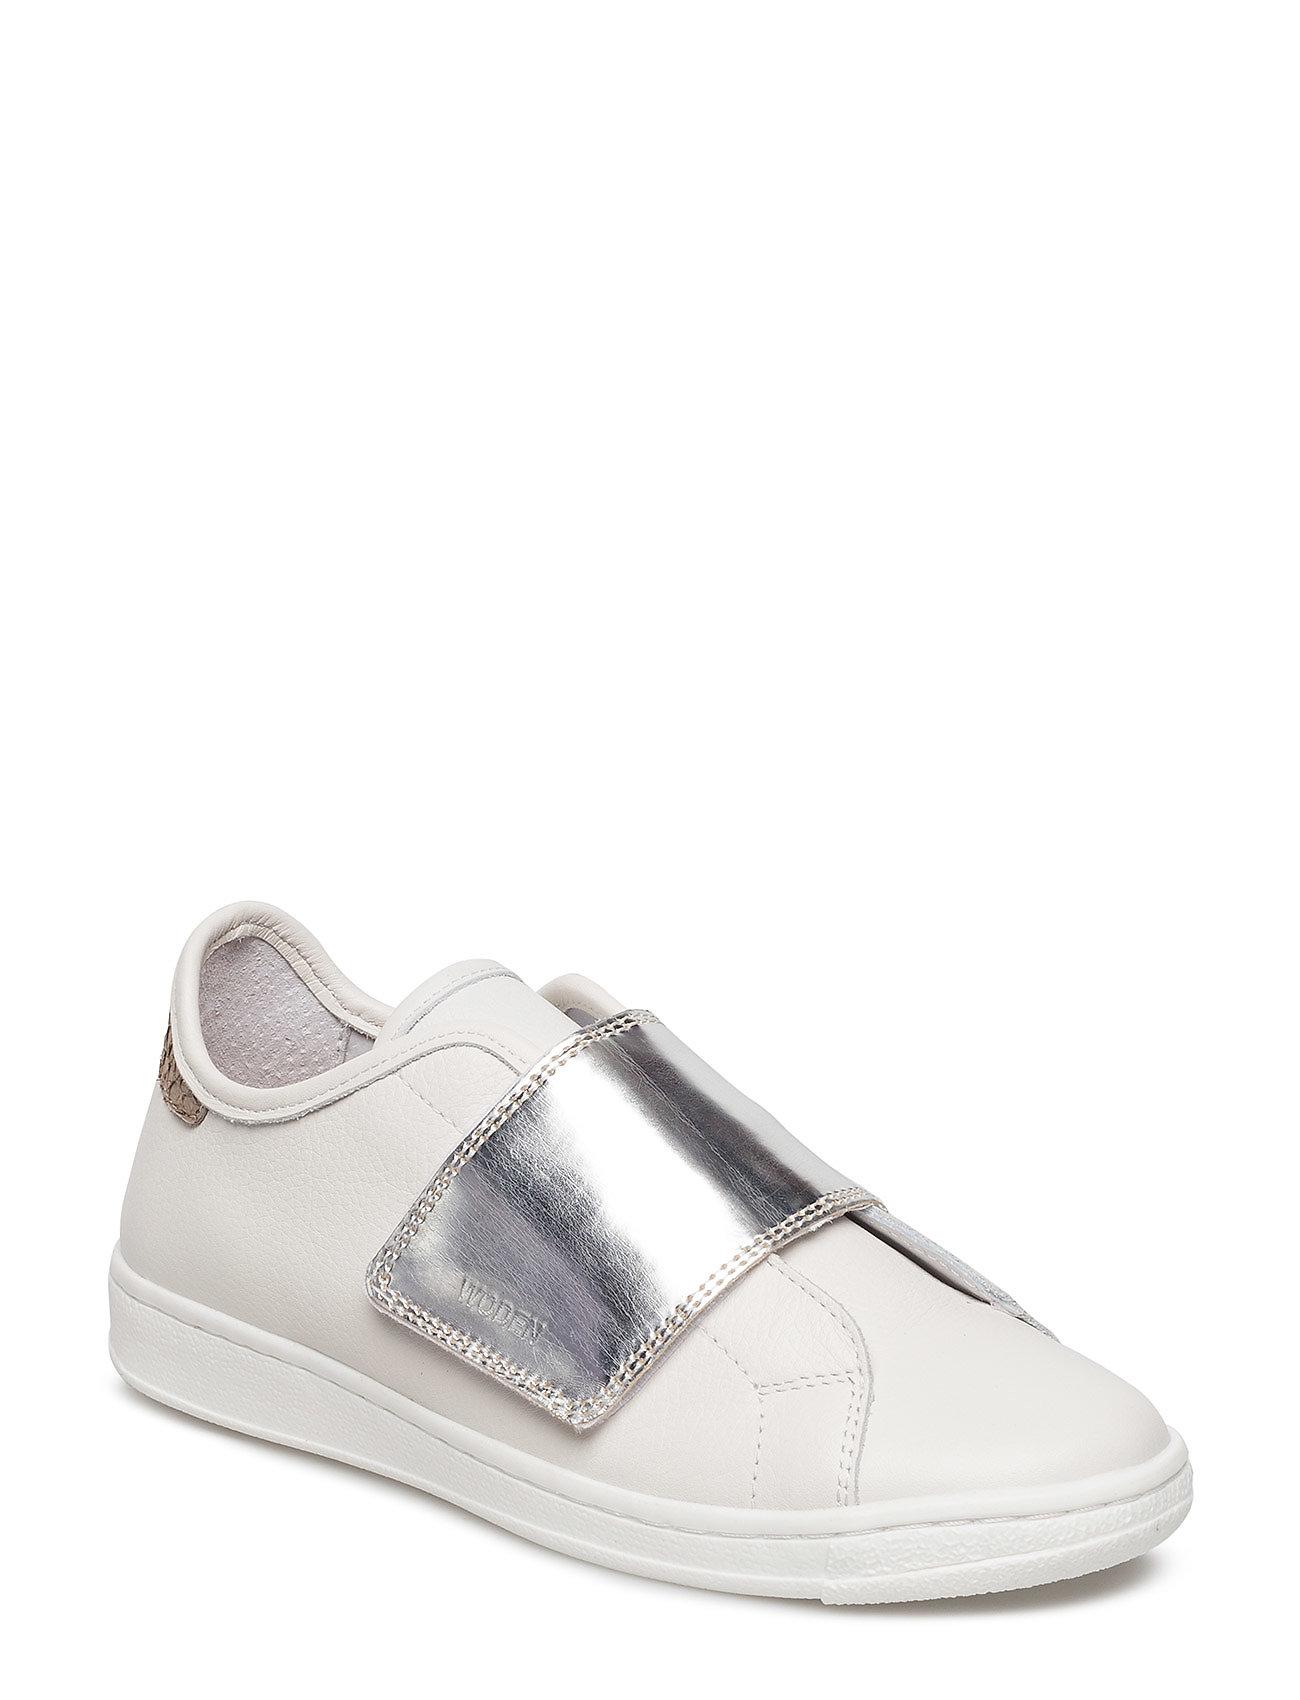 3340c1037fb4 Wrap Wonder Metallic Teen (Bright White  Silver) (649.95 kr) - Woden ...